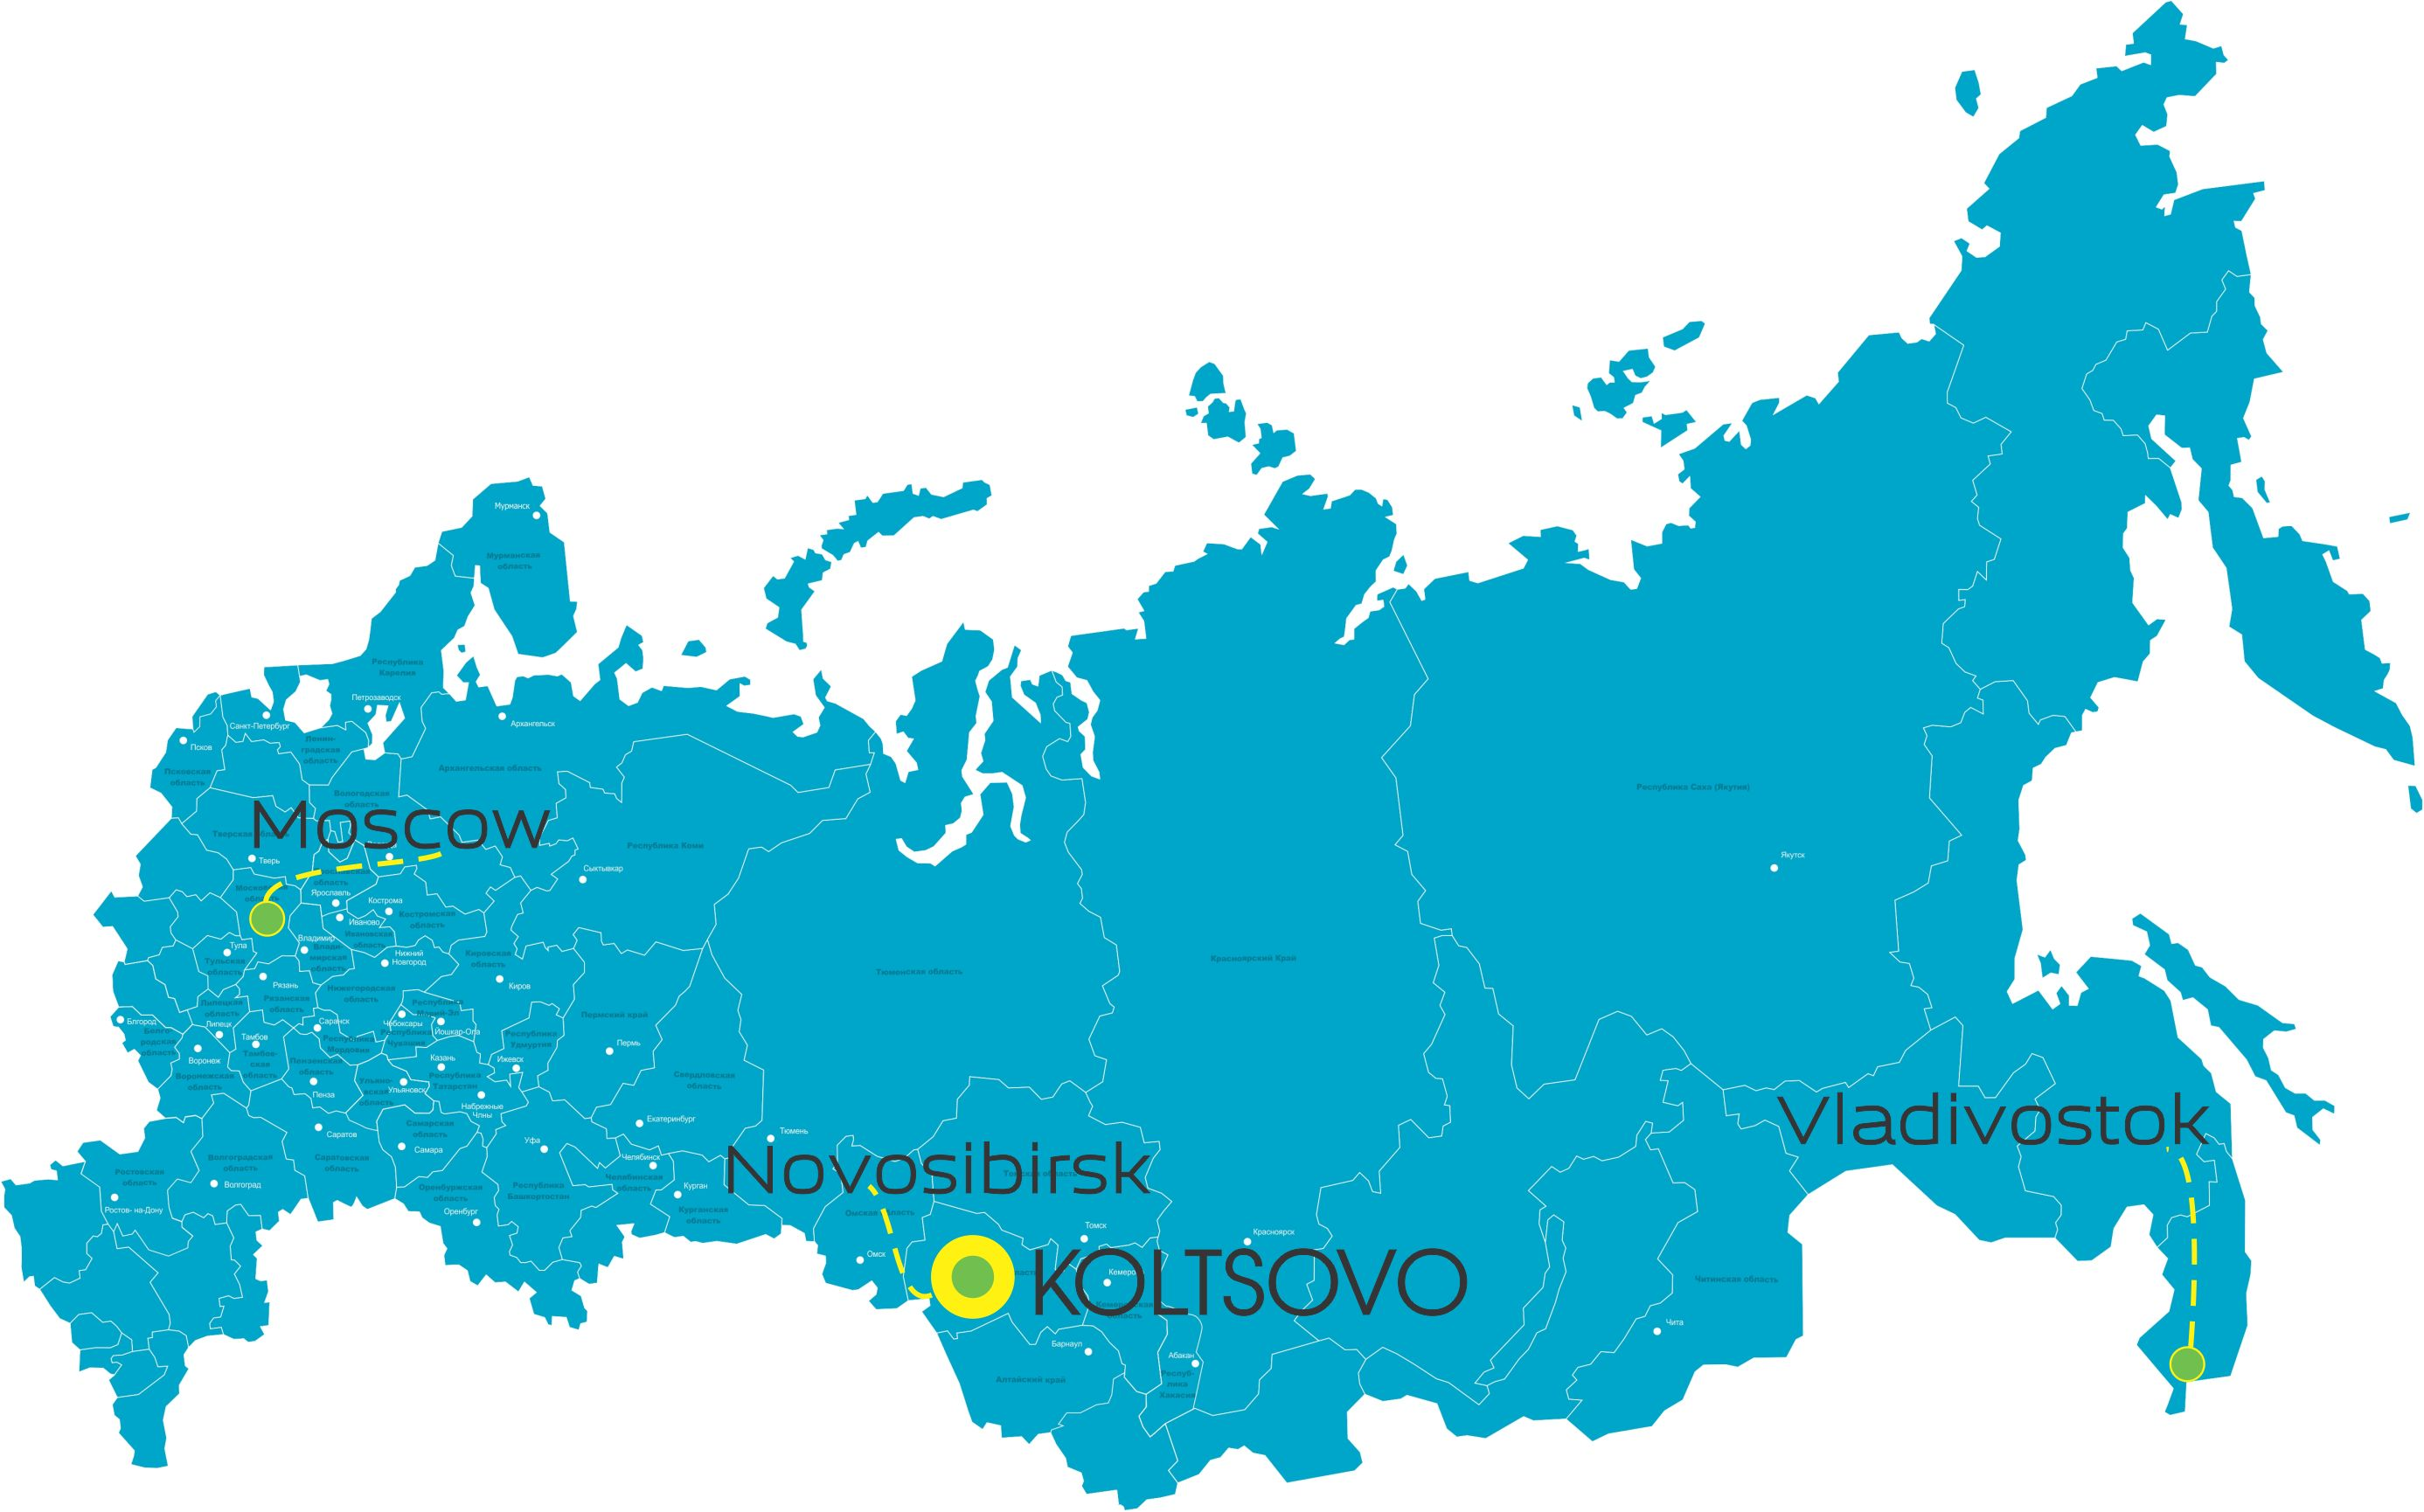 FileRussian map with Koltsovojpg Wikimedia Commons